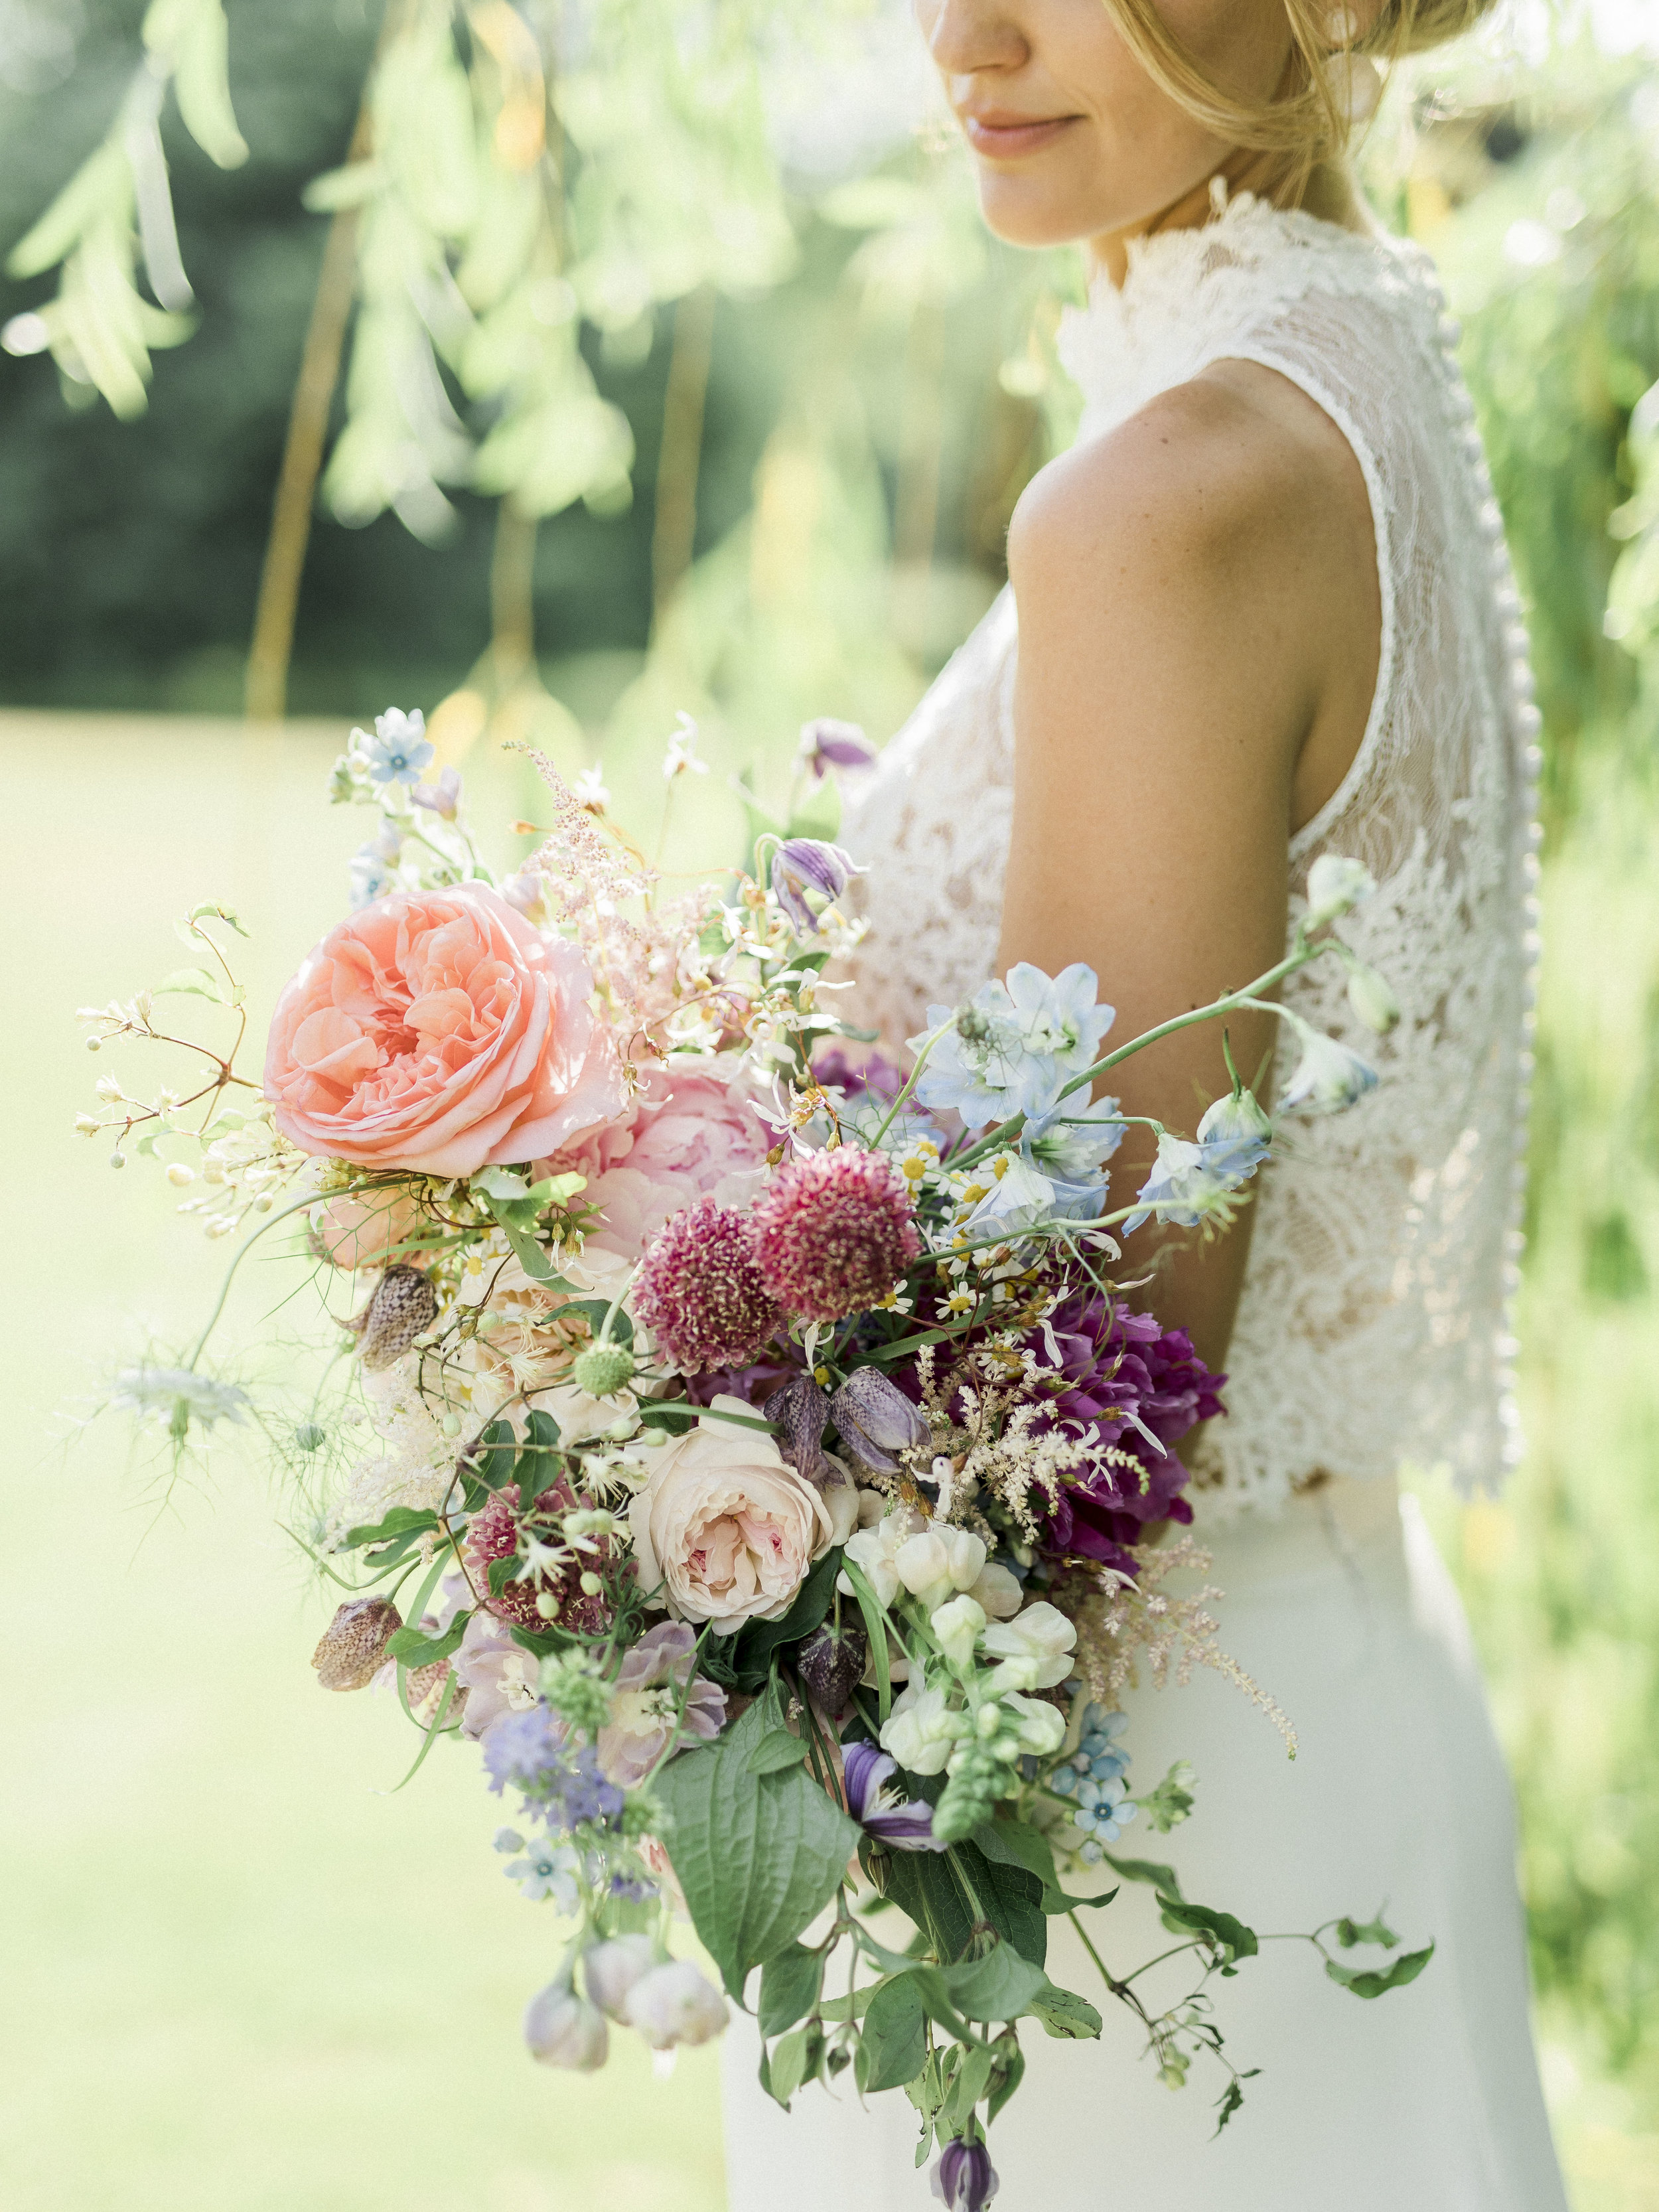 fine art wedding photographer elisabeth van lent - wedding ferme de balingue bruiloft-22.JPG